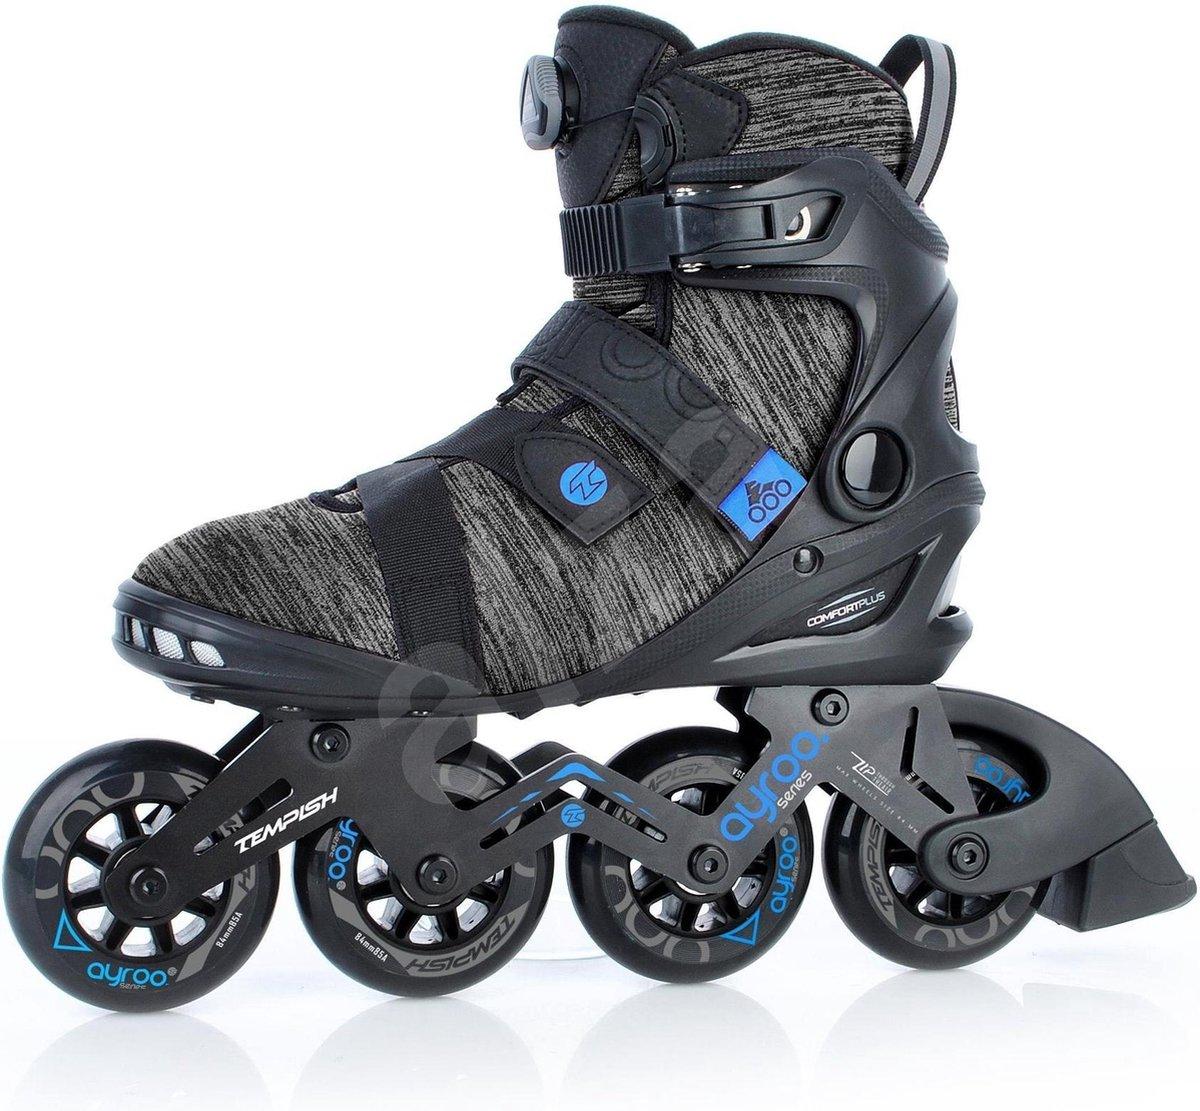 Tempish Inline Skate Ayroo Top 84 - Zwart-blauw - Maat 41